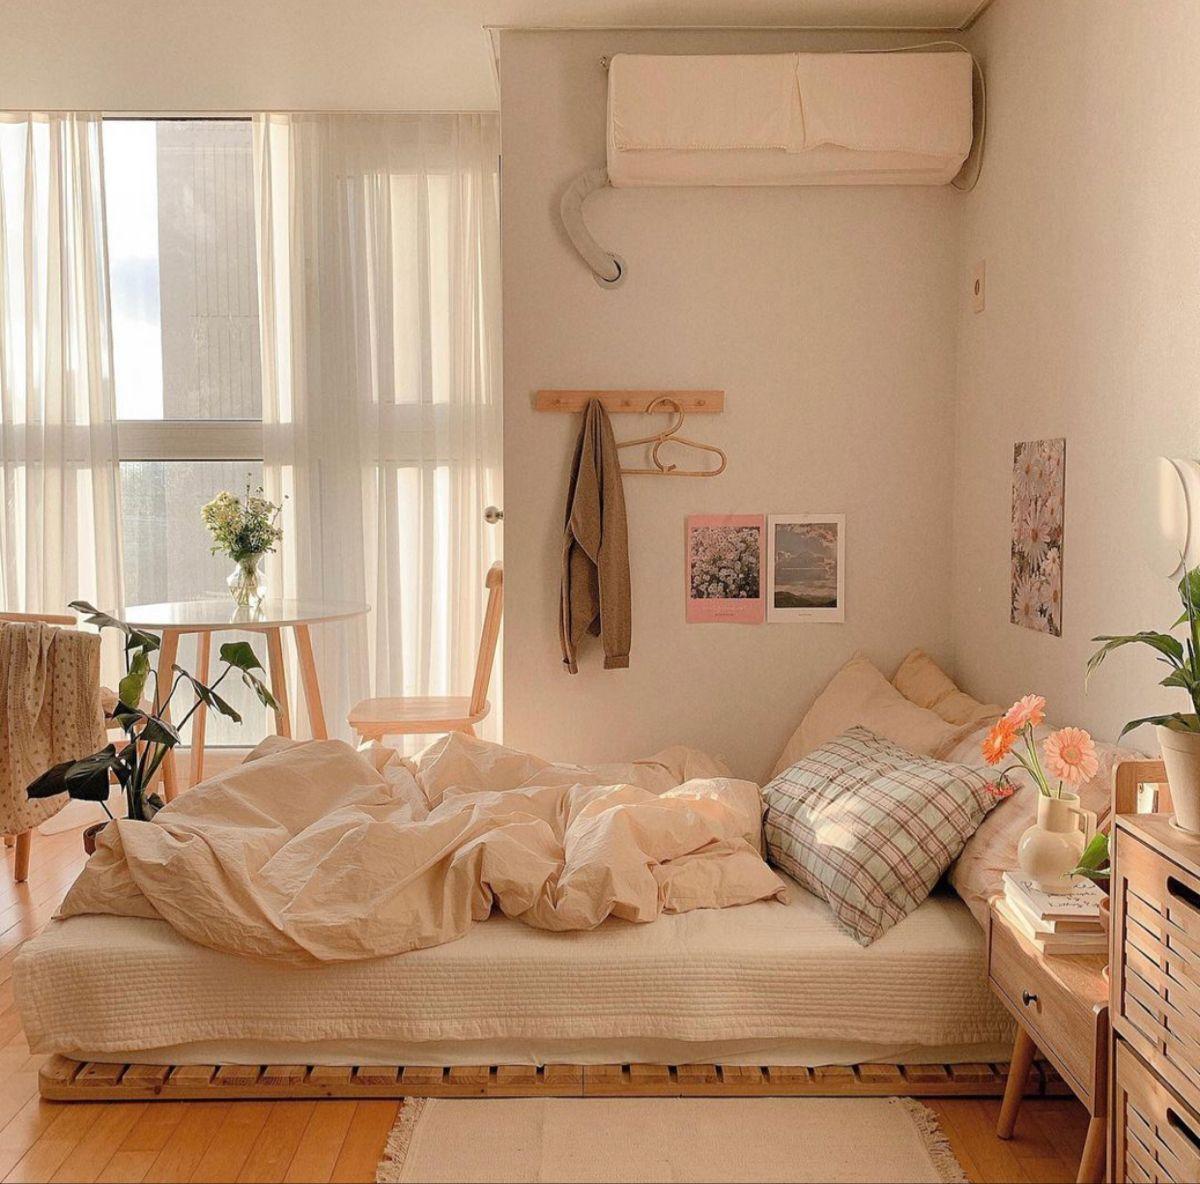 Pin By Ashlee Yepez On Interior In 2021 Room Design Bedroom Room Inspiration Bedroom Bedroom Interior Korean-style minimalist bedroom decoration